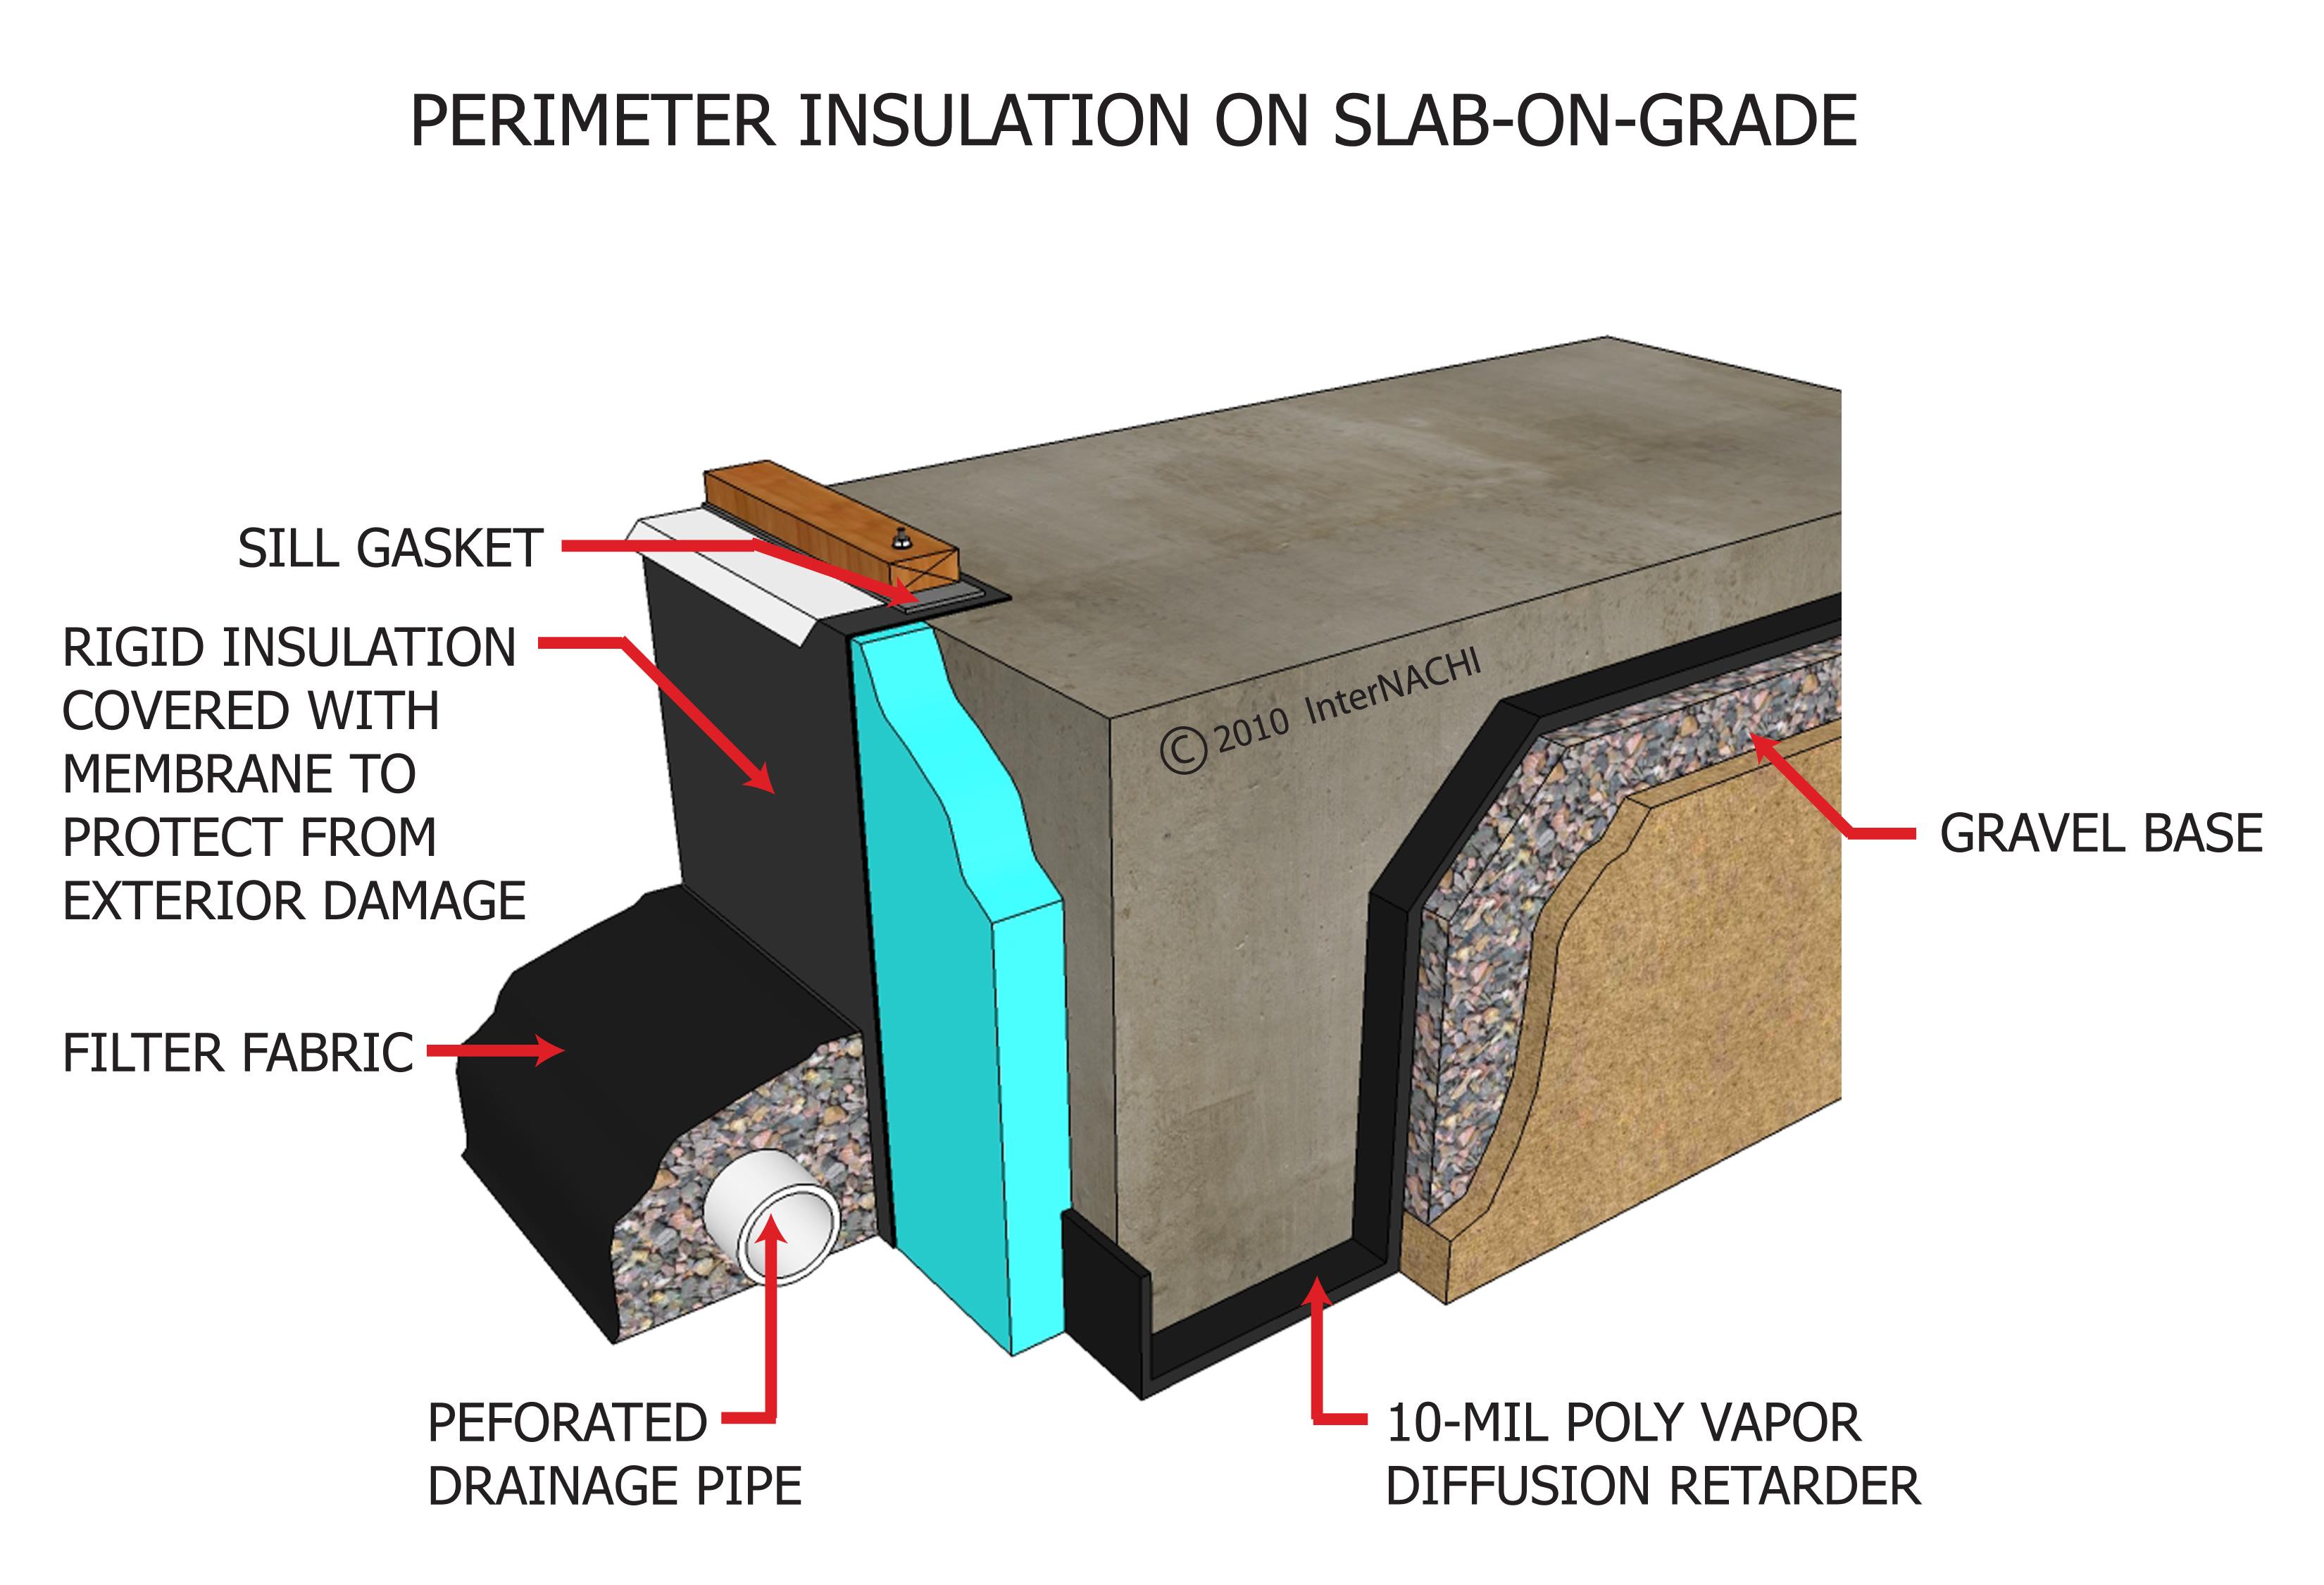 Perimeter insulation on slab-on-grade.